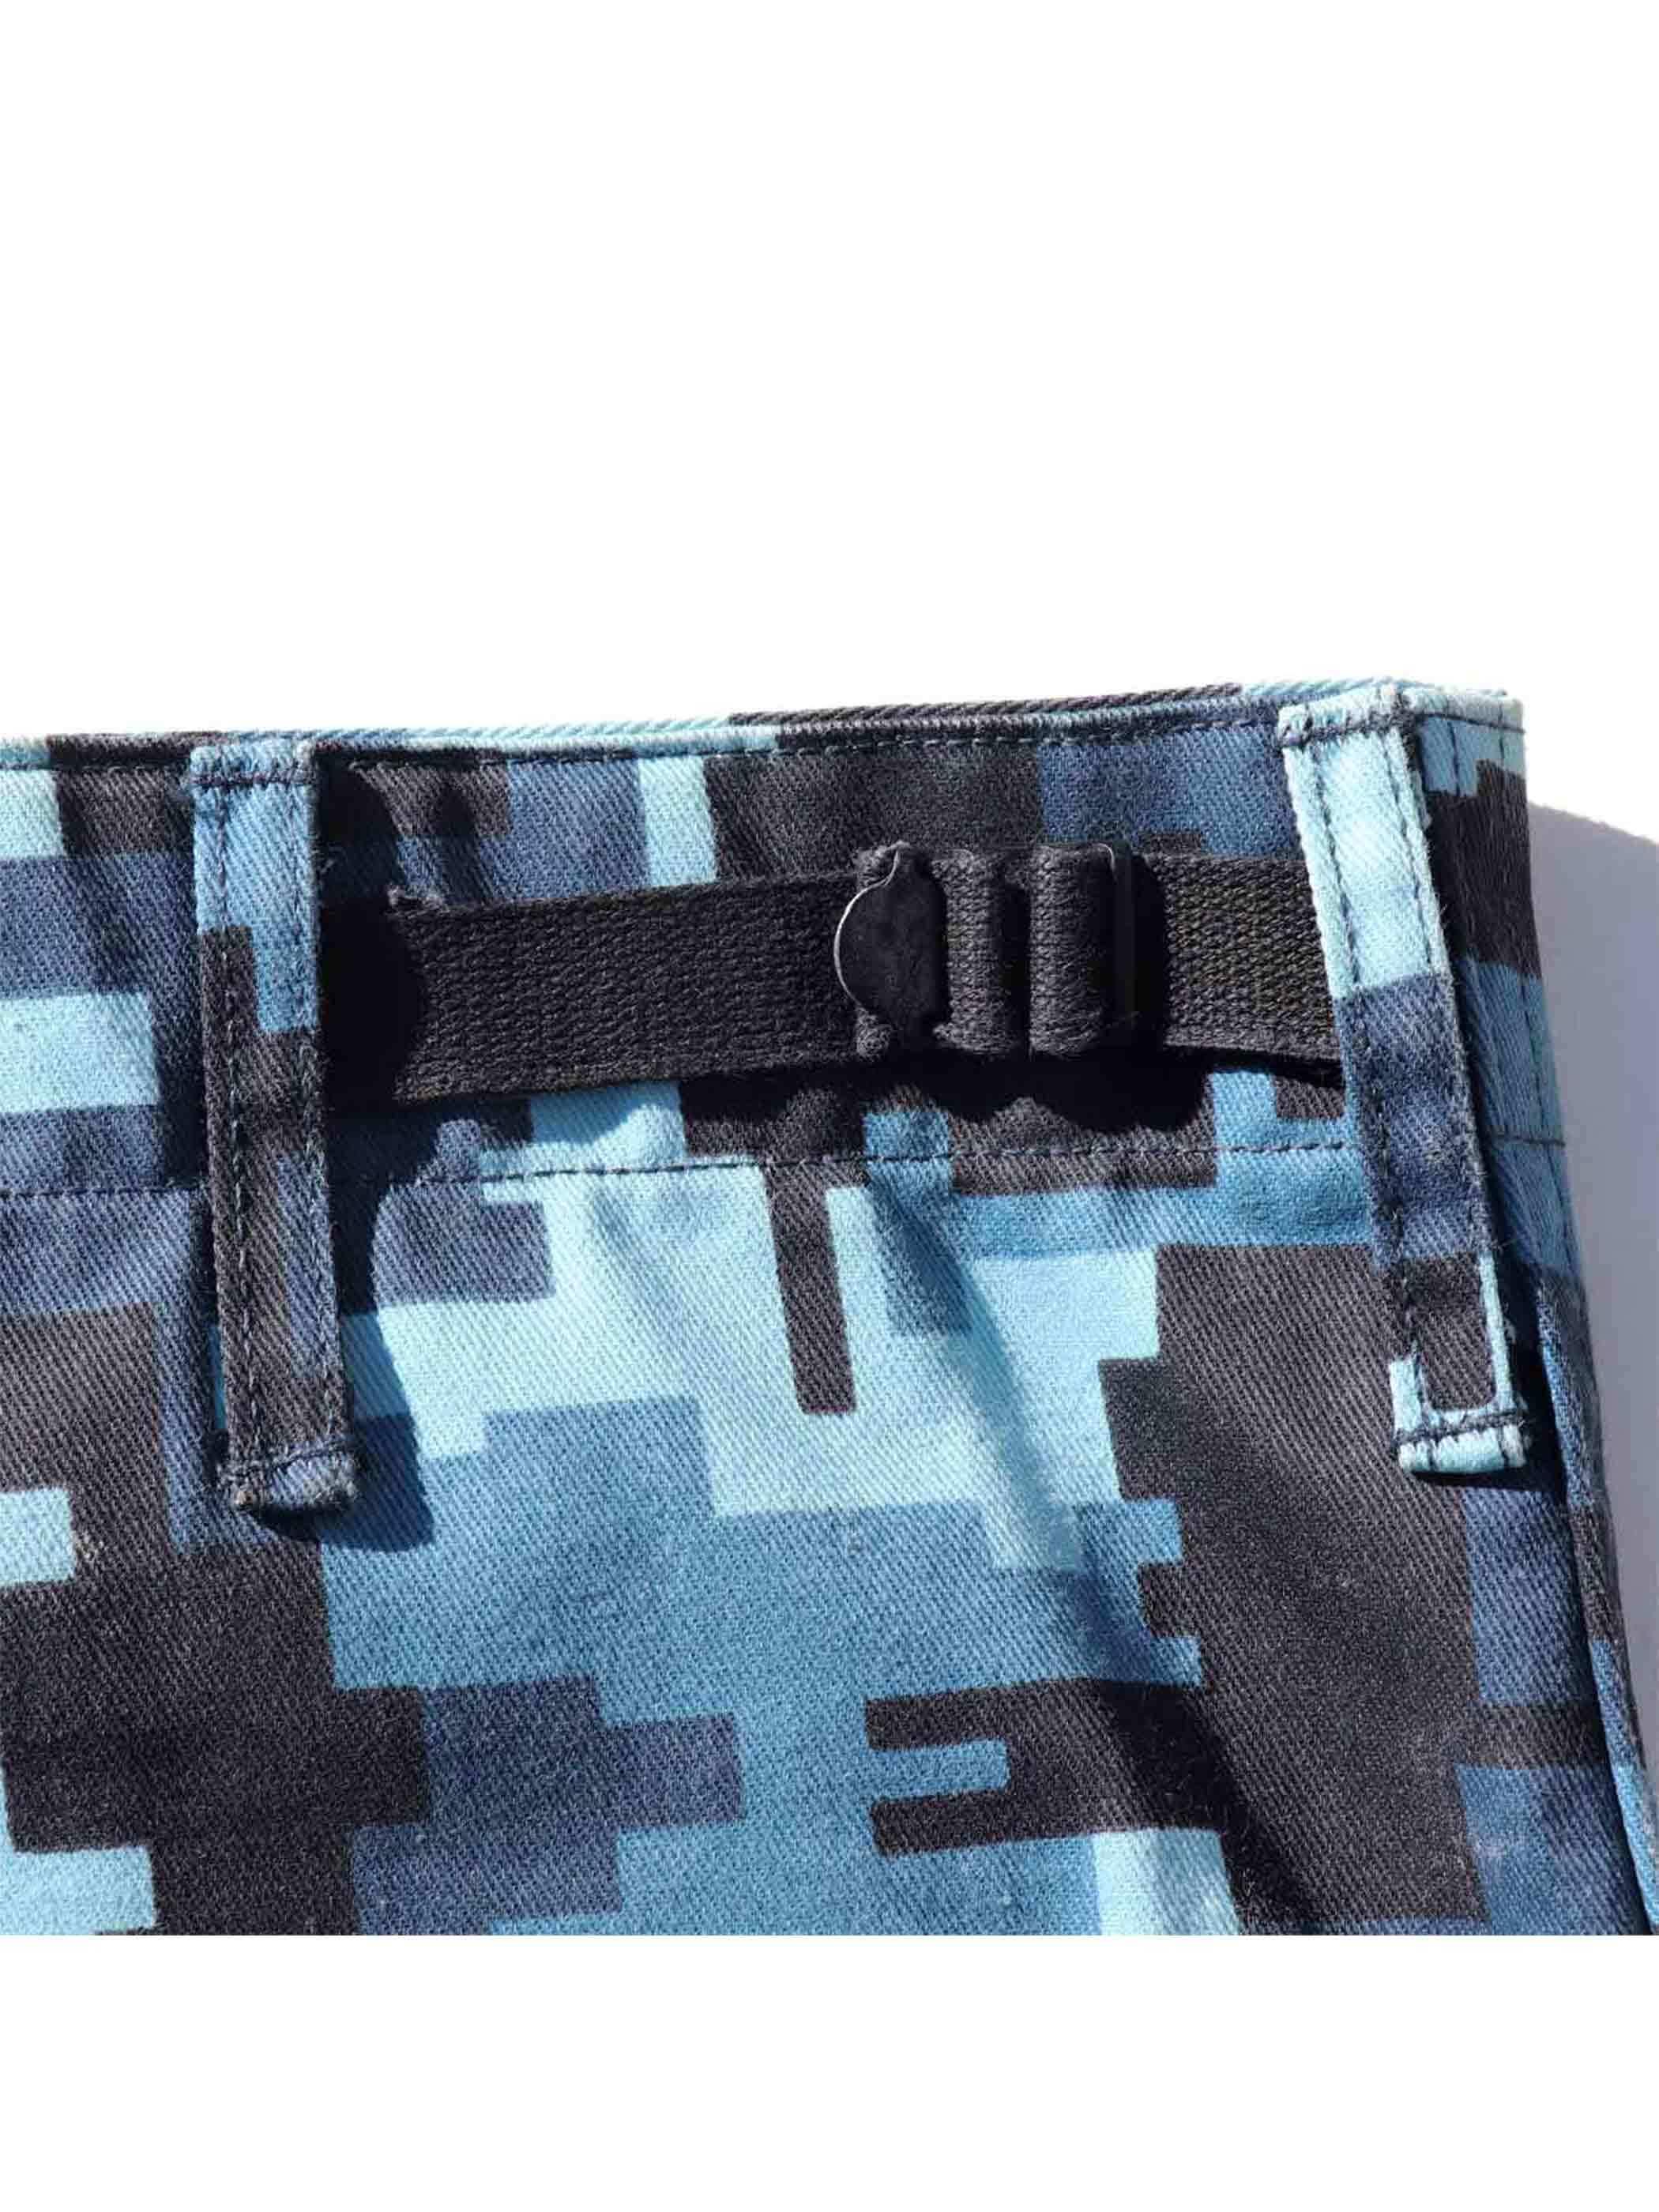 "90's CIVILIAN ""TECHNOFLAGE"" Combat Trousers Made In U.S.A. [L-R]"